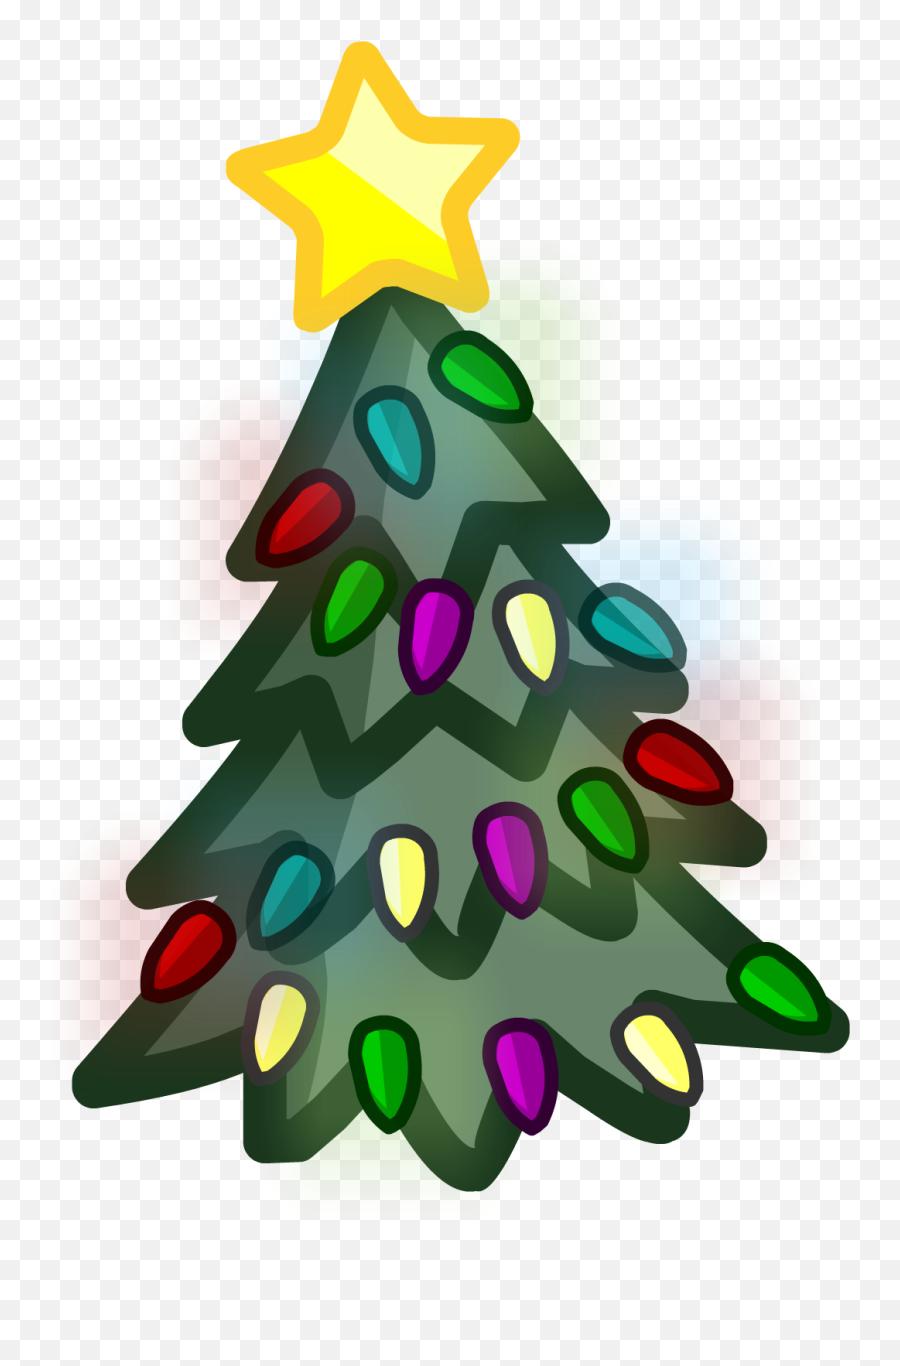 Holiday Party 2016 Tree Emoticon - Christmas Tree Emoji,Christmas Tree Emoticon